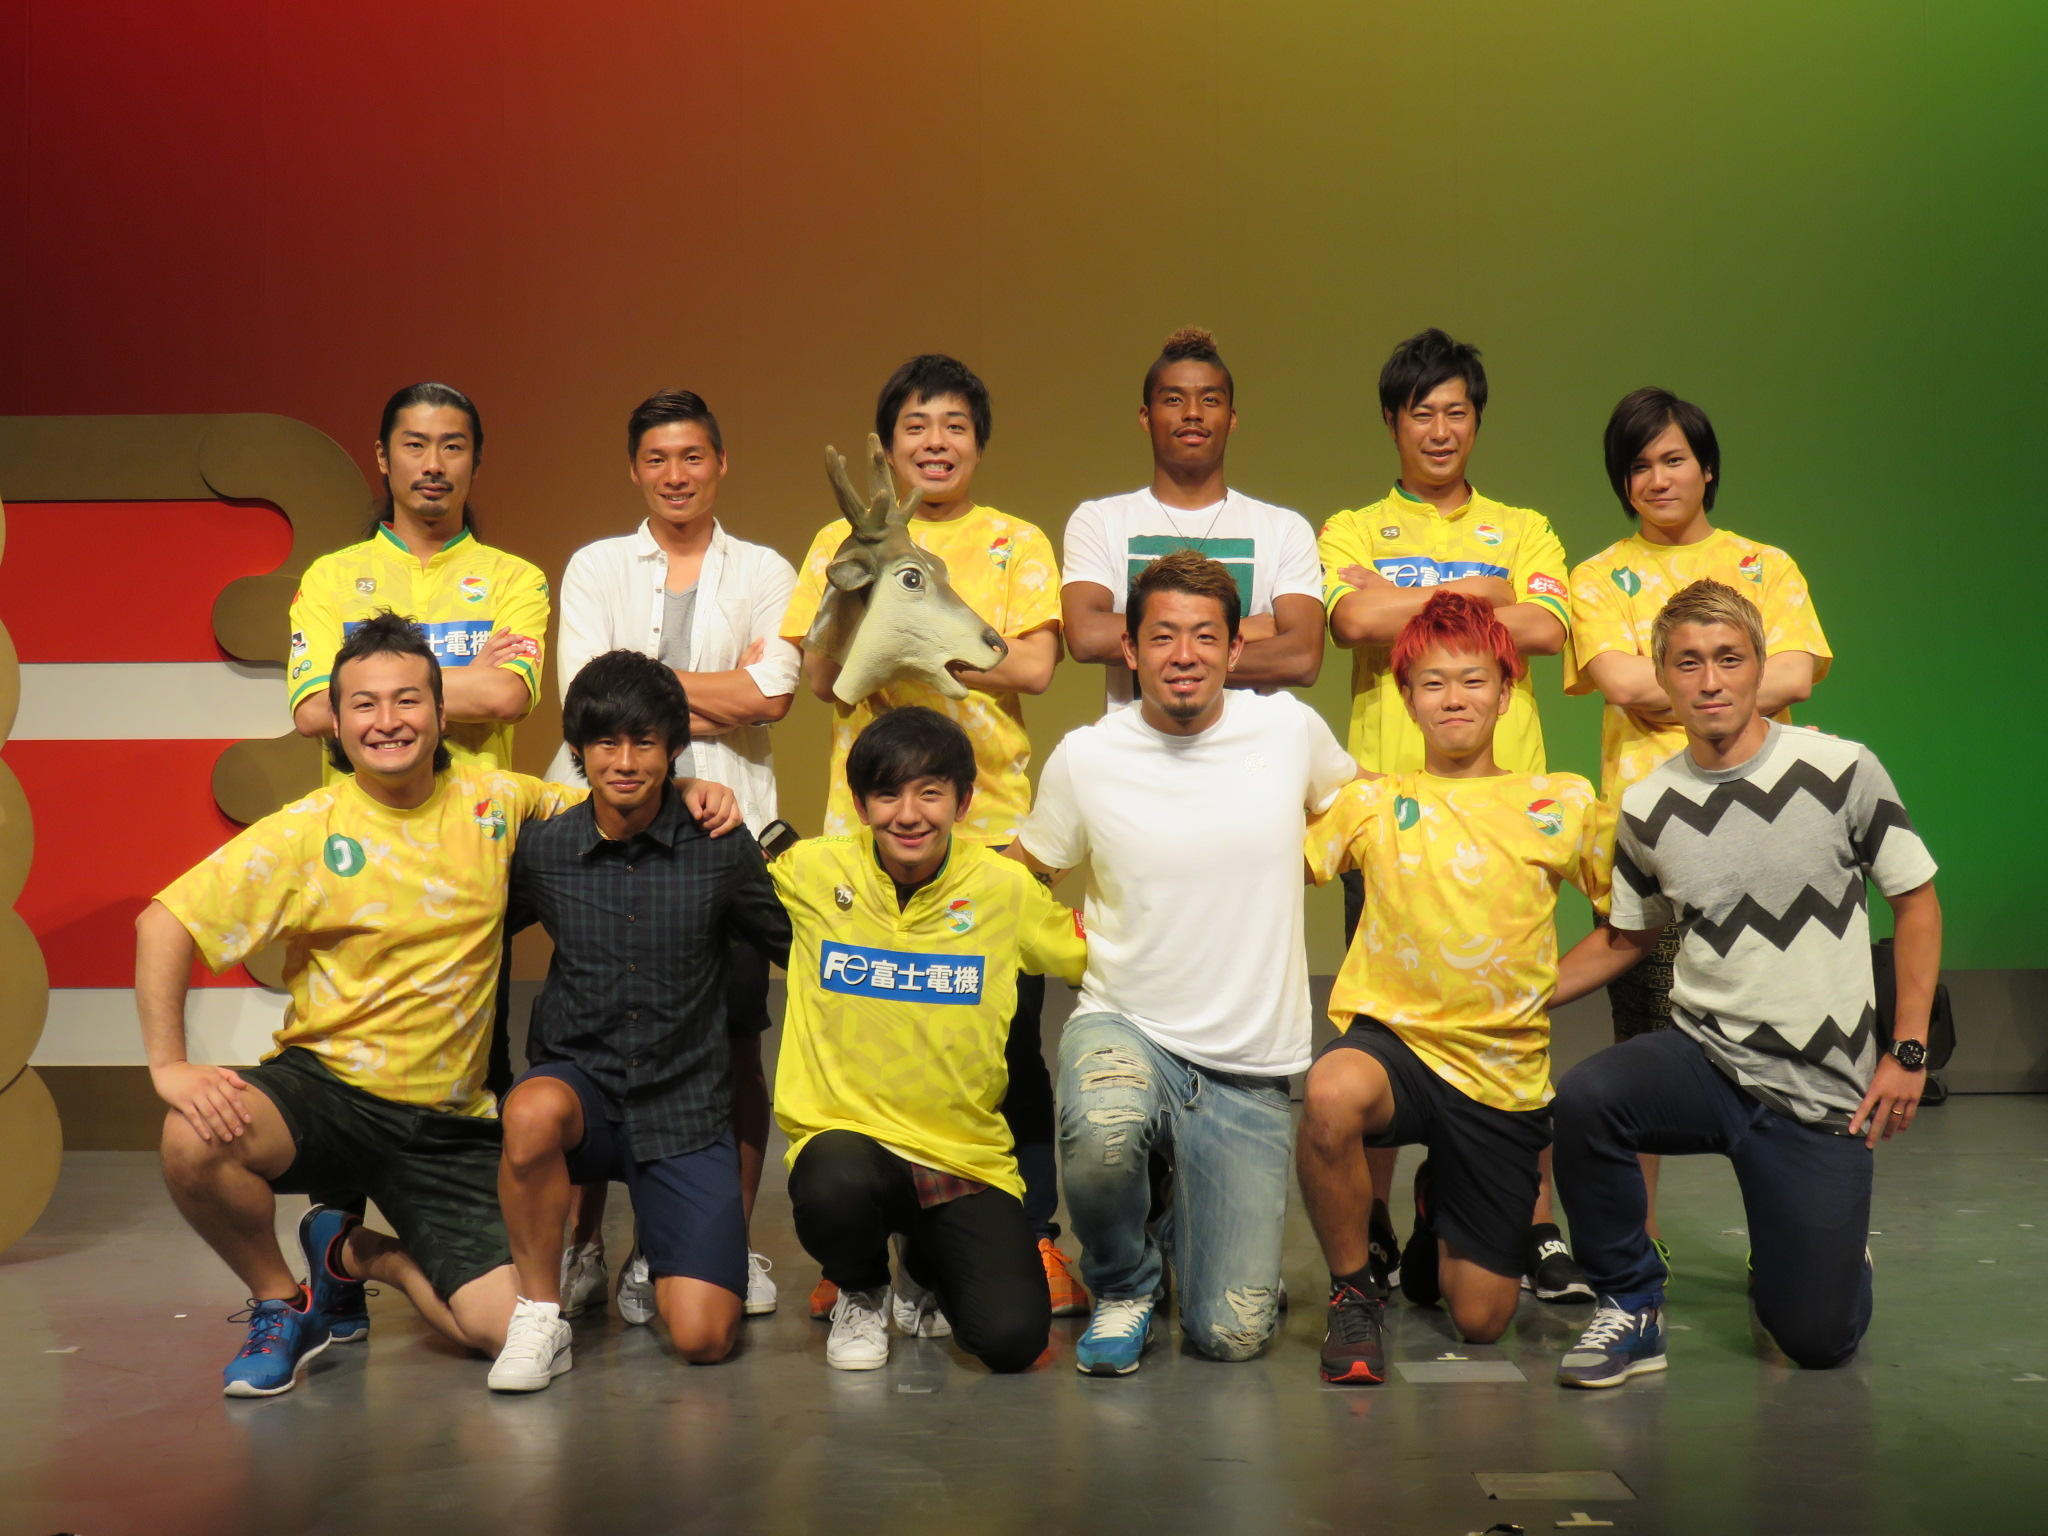 http://news.yoshimoto.co.jp/20160830230958-e5e7d8cbdac954a5396af29e8f6cac61695bbacf.jpg